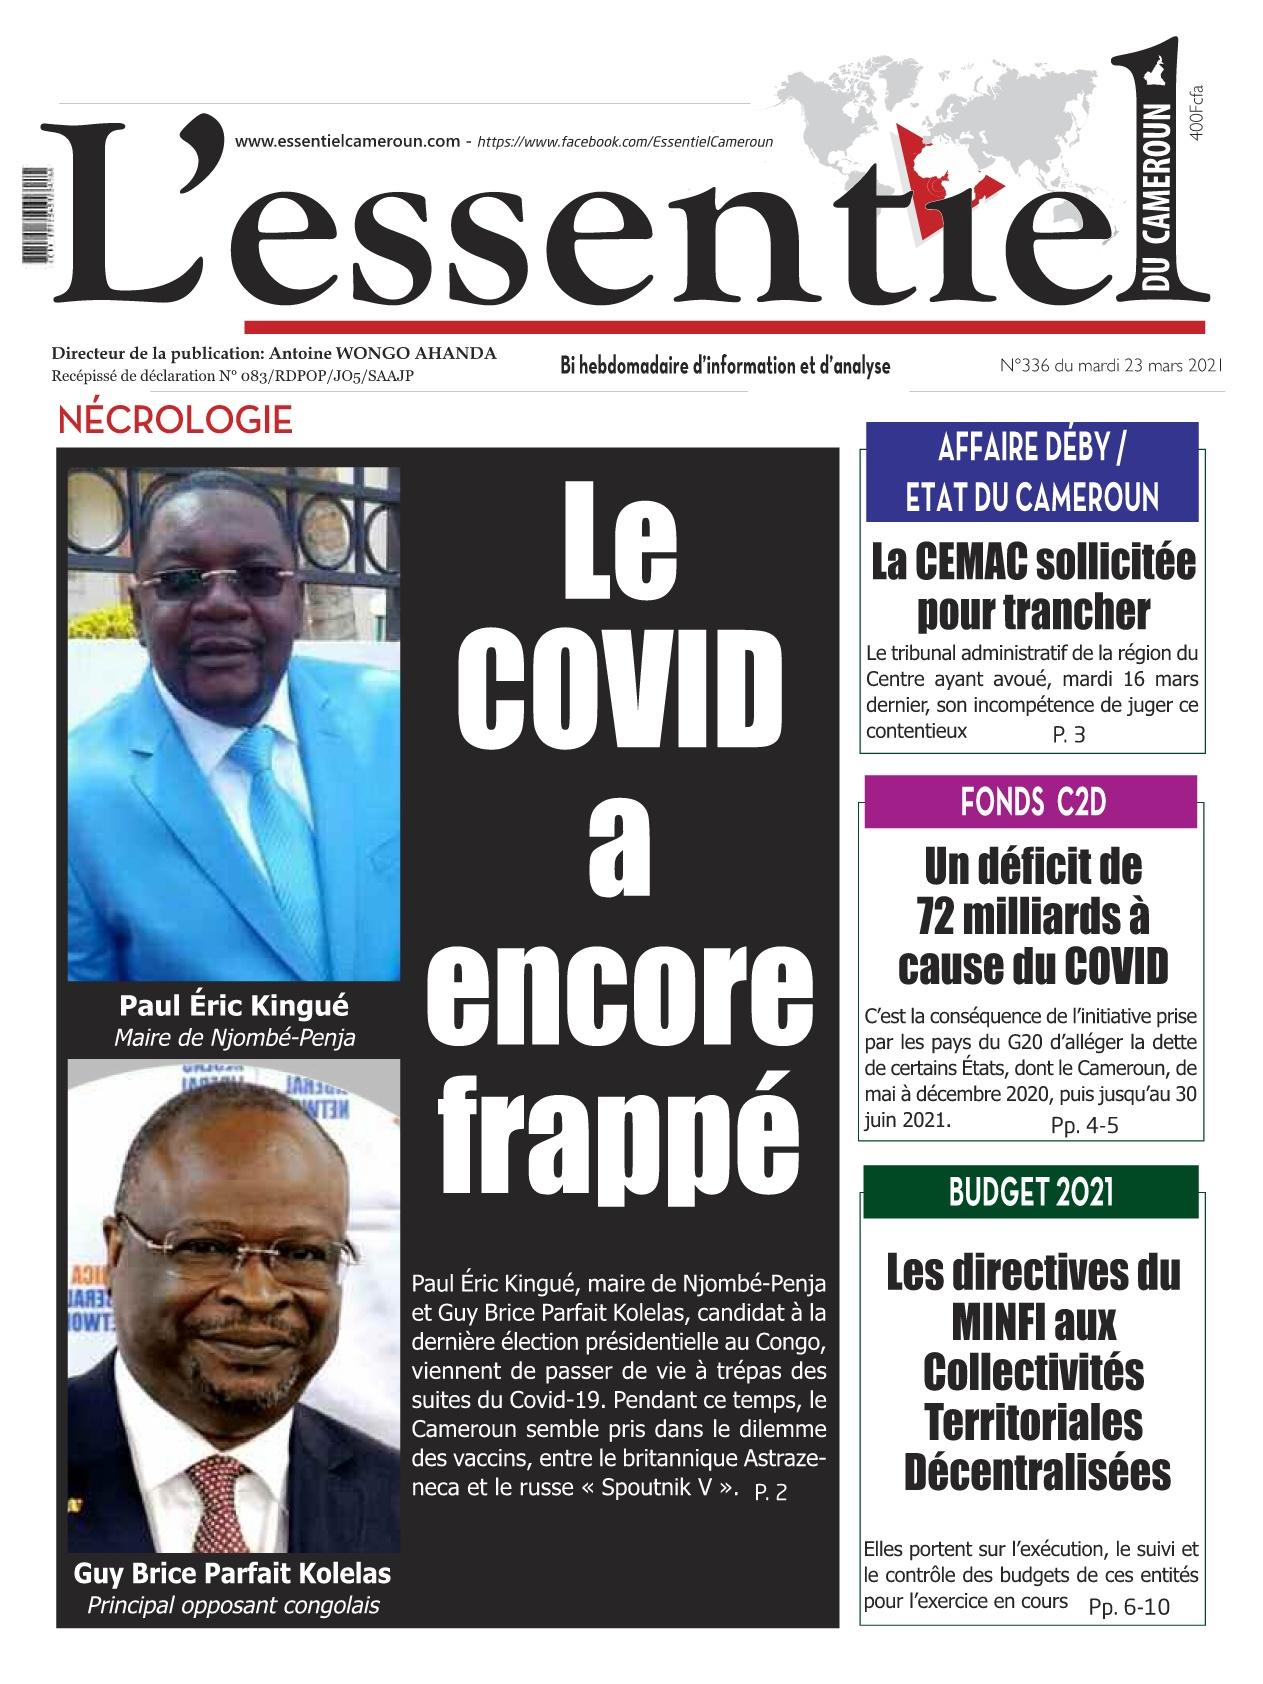 L'essentiel du Cameroun - 23/03/2021